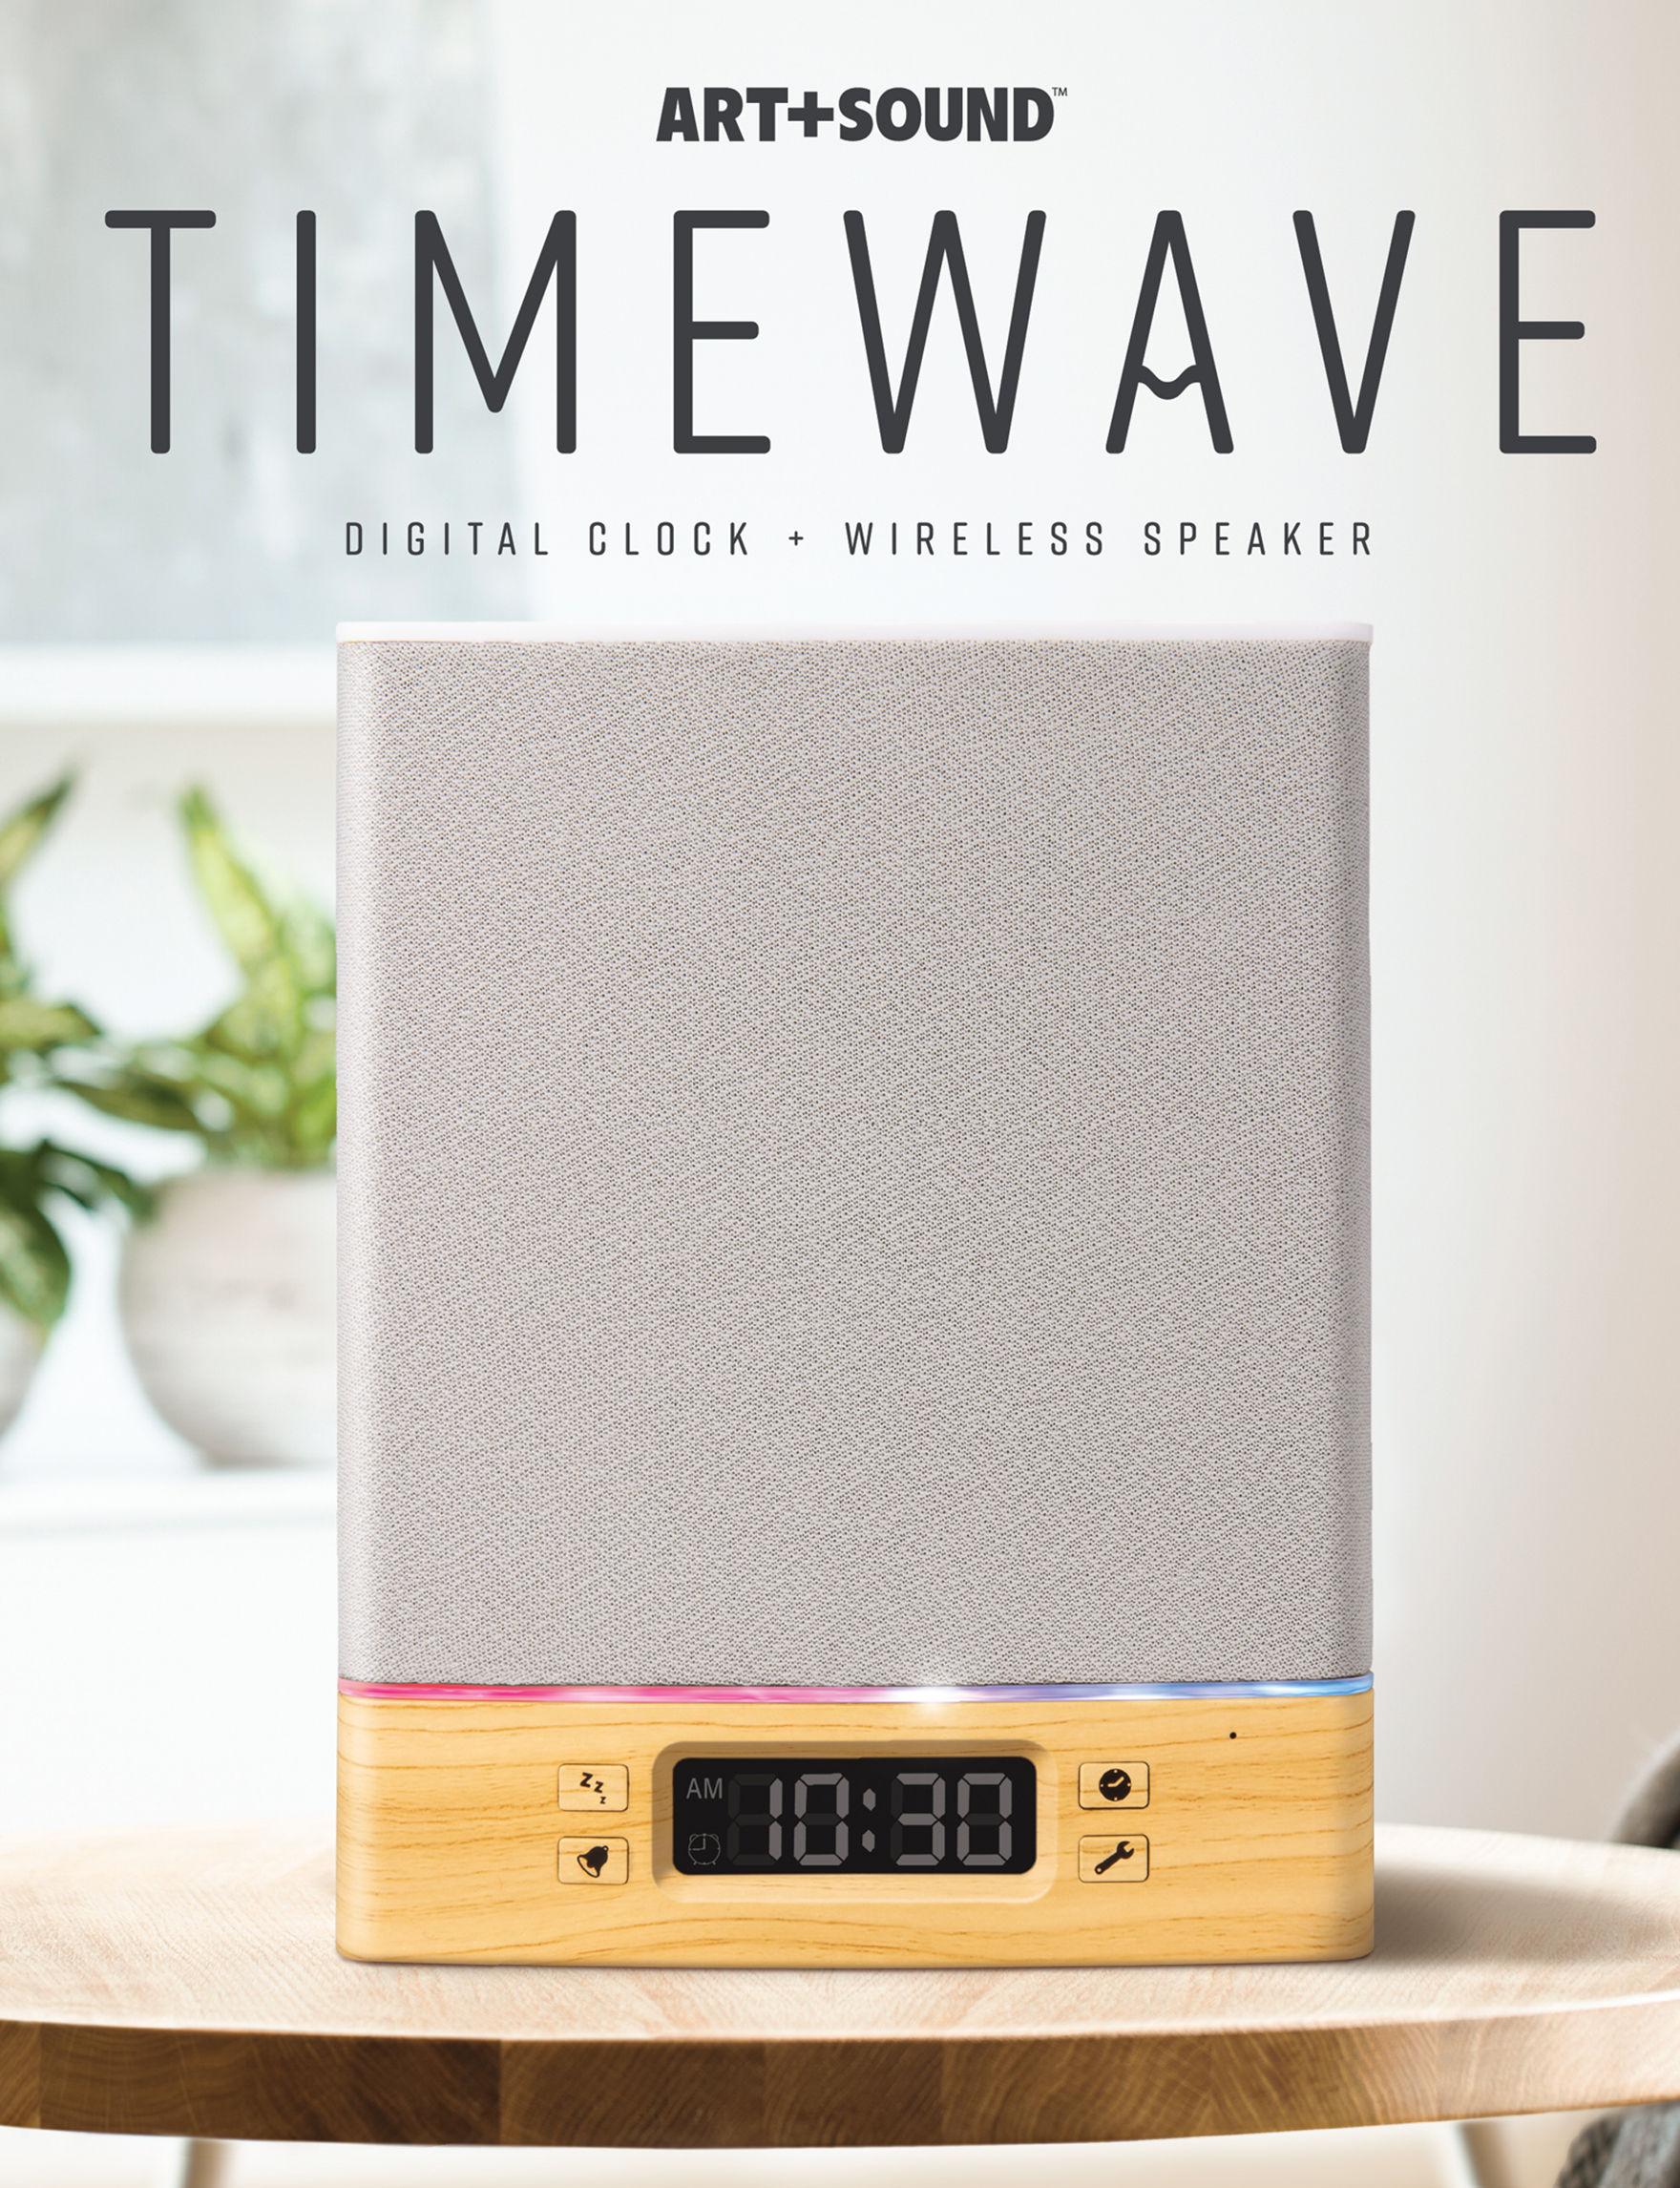 Art + Sound White / Gold Speakers & Docks Home & Portable Audio